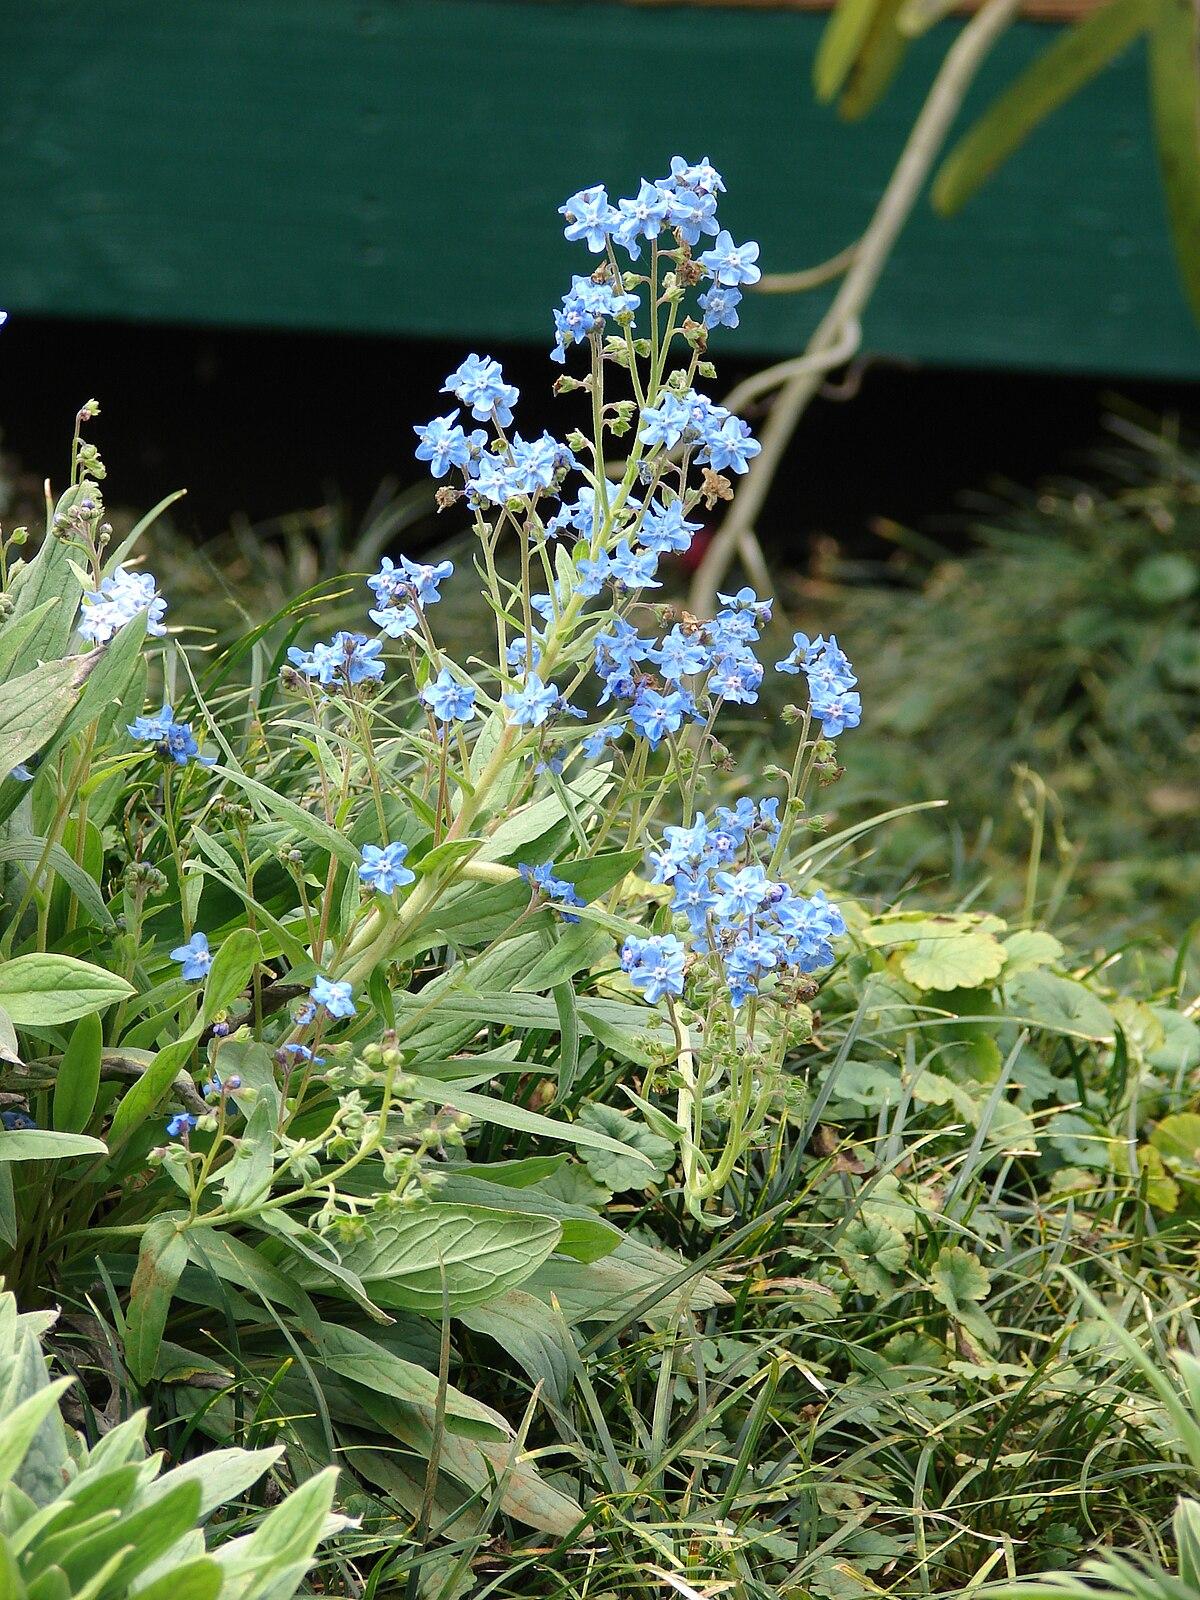 Cynoglossum amabile - Wikispecies